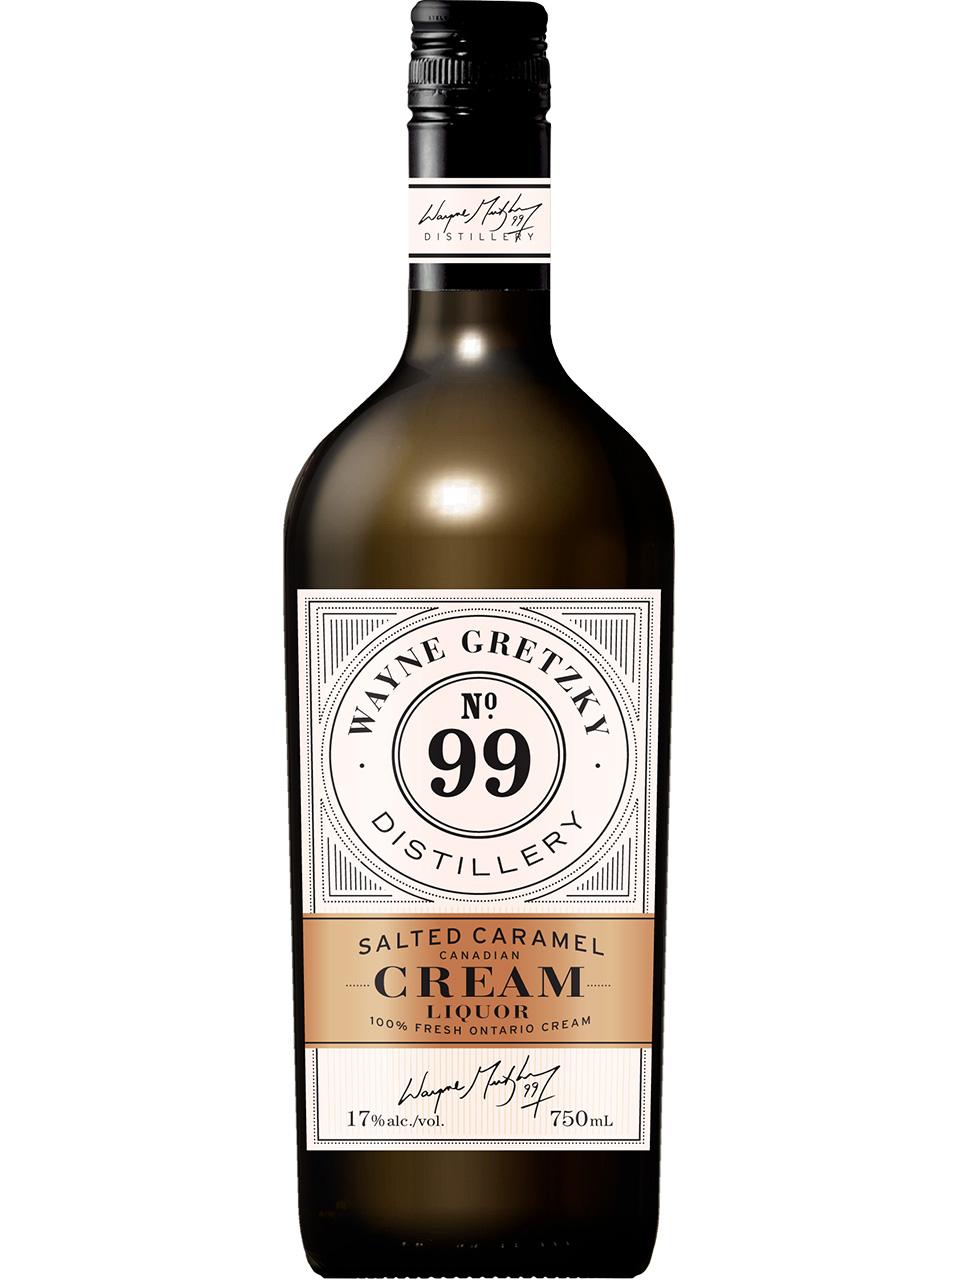 Wayne Gretzky Salted Caramel Cream Whisky Liqueur